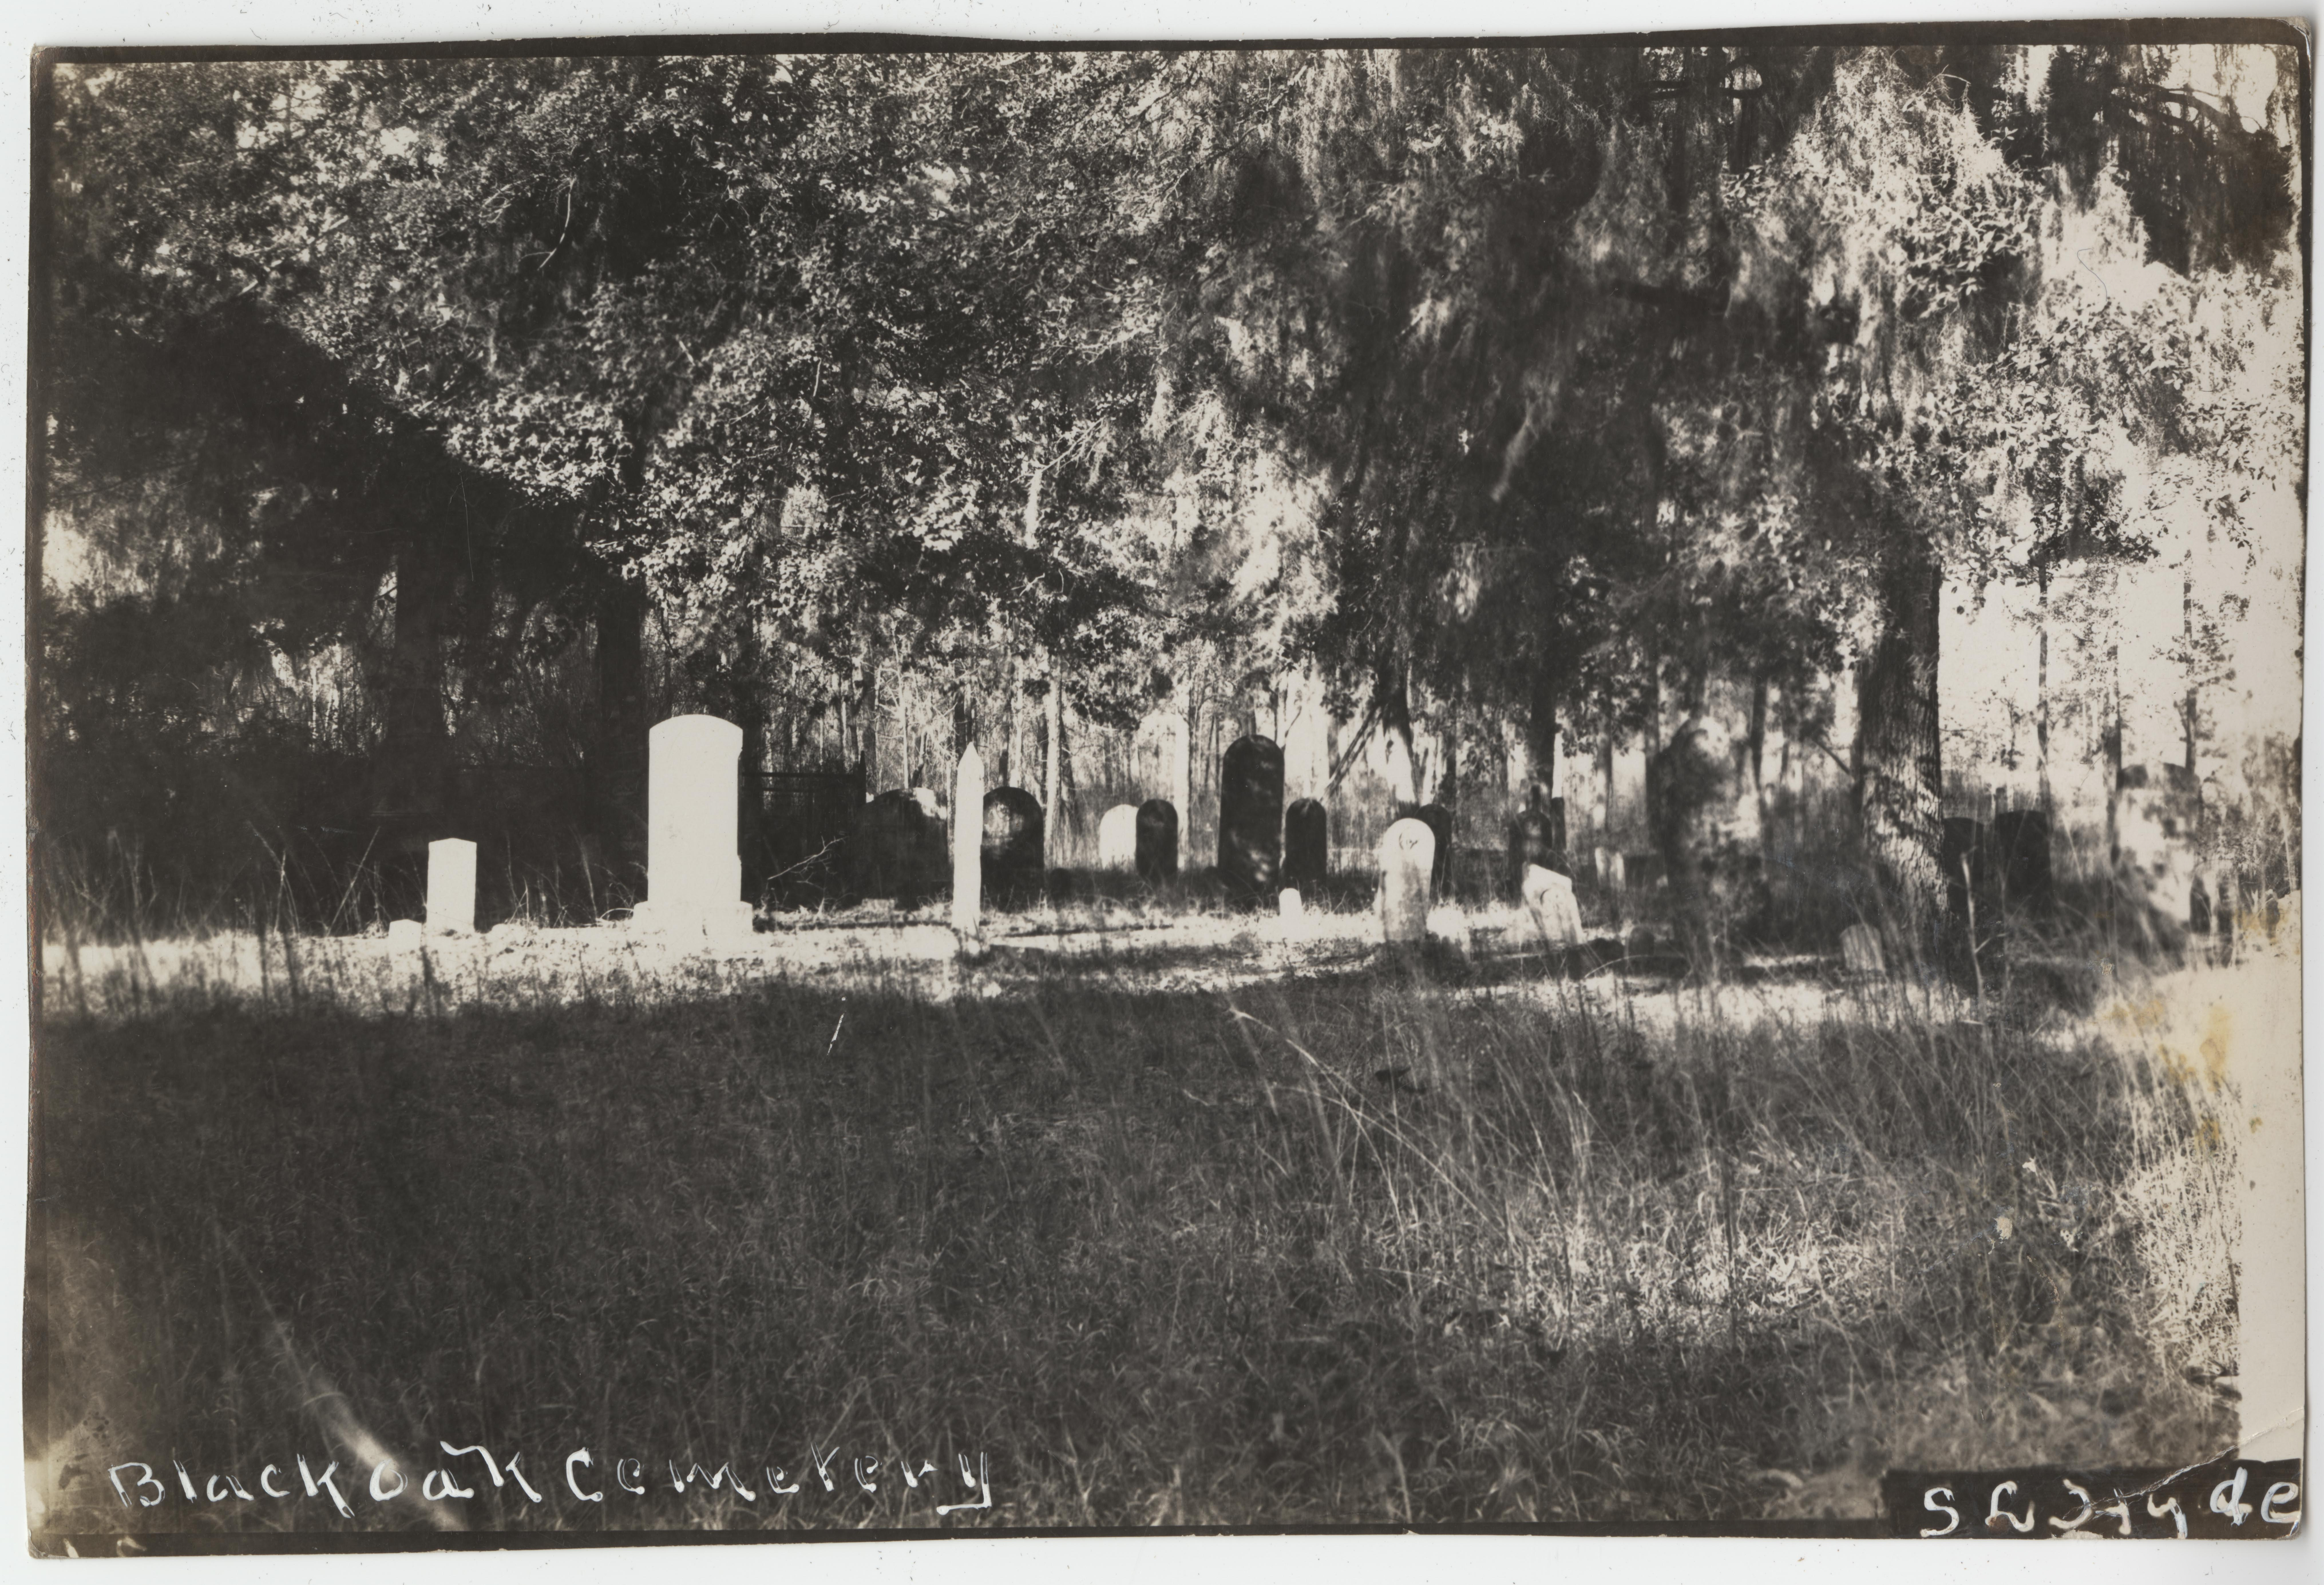 Santee-Cooper Cemetery Investigation 093